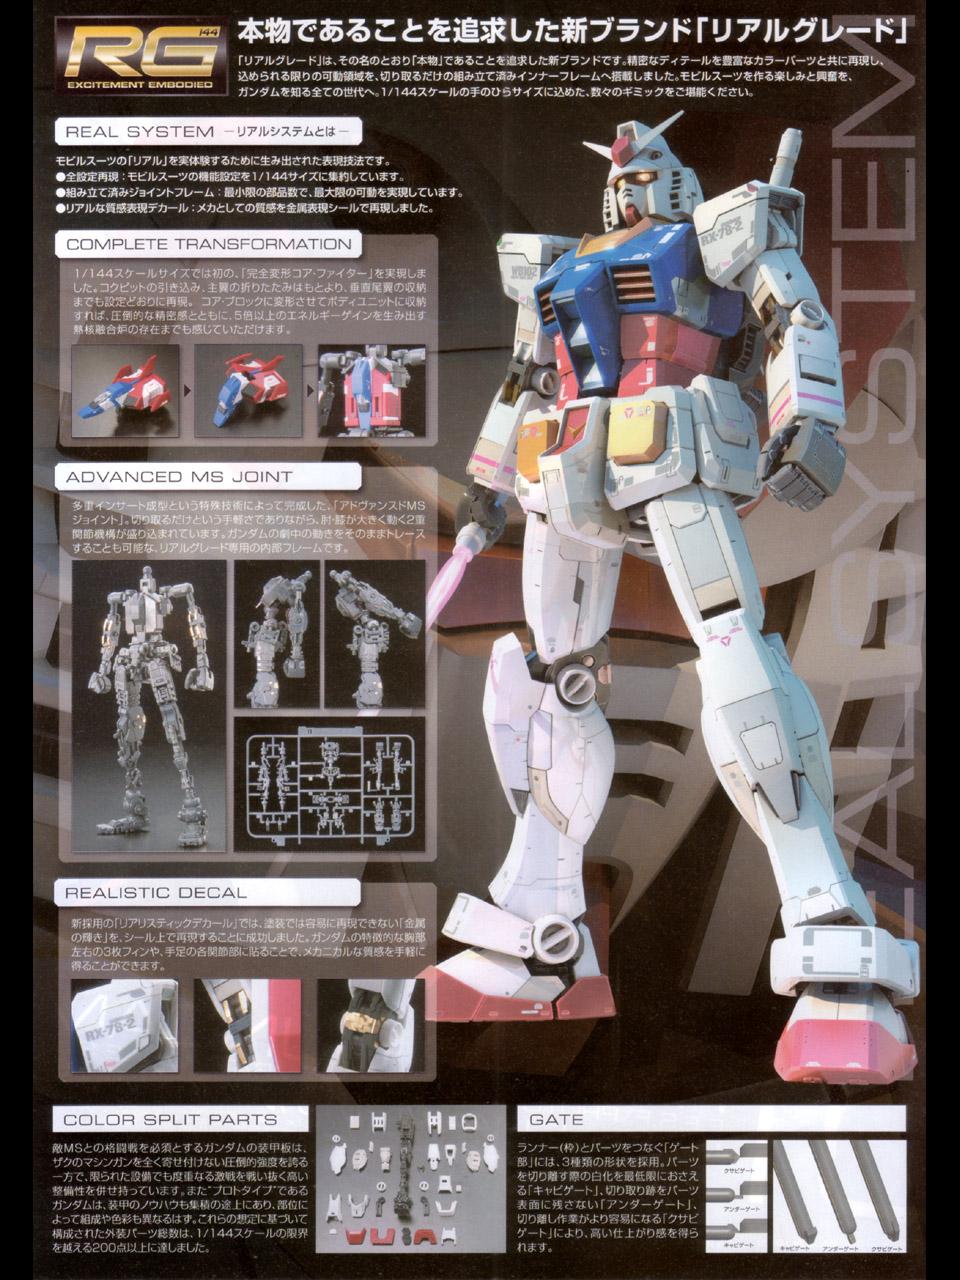 RG_RX78_2_Gundam_07.jpg